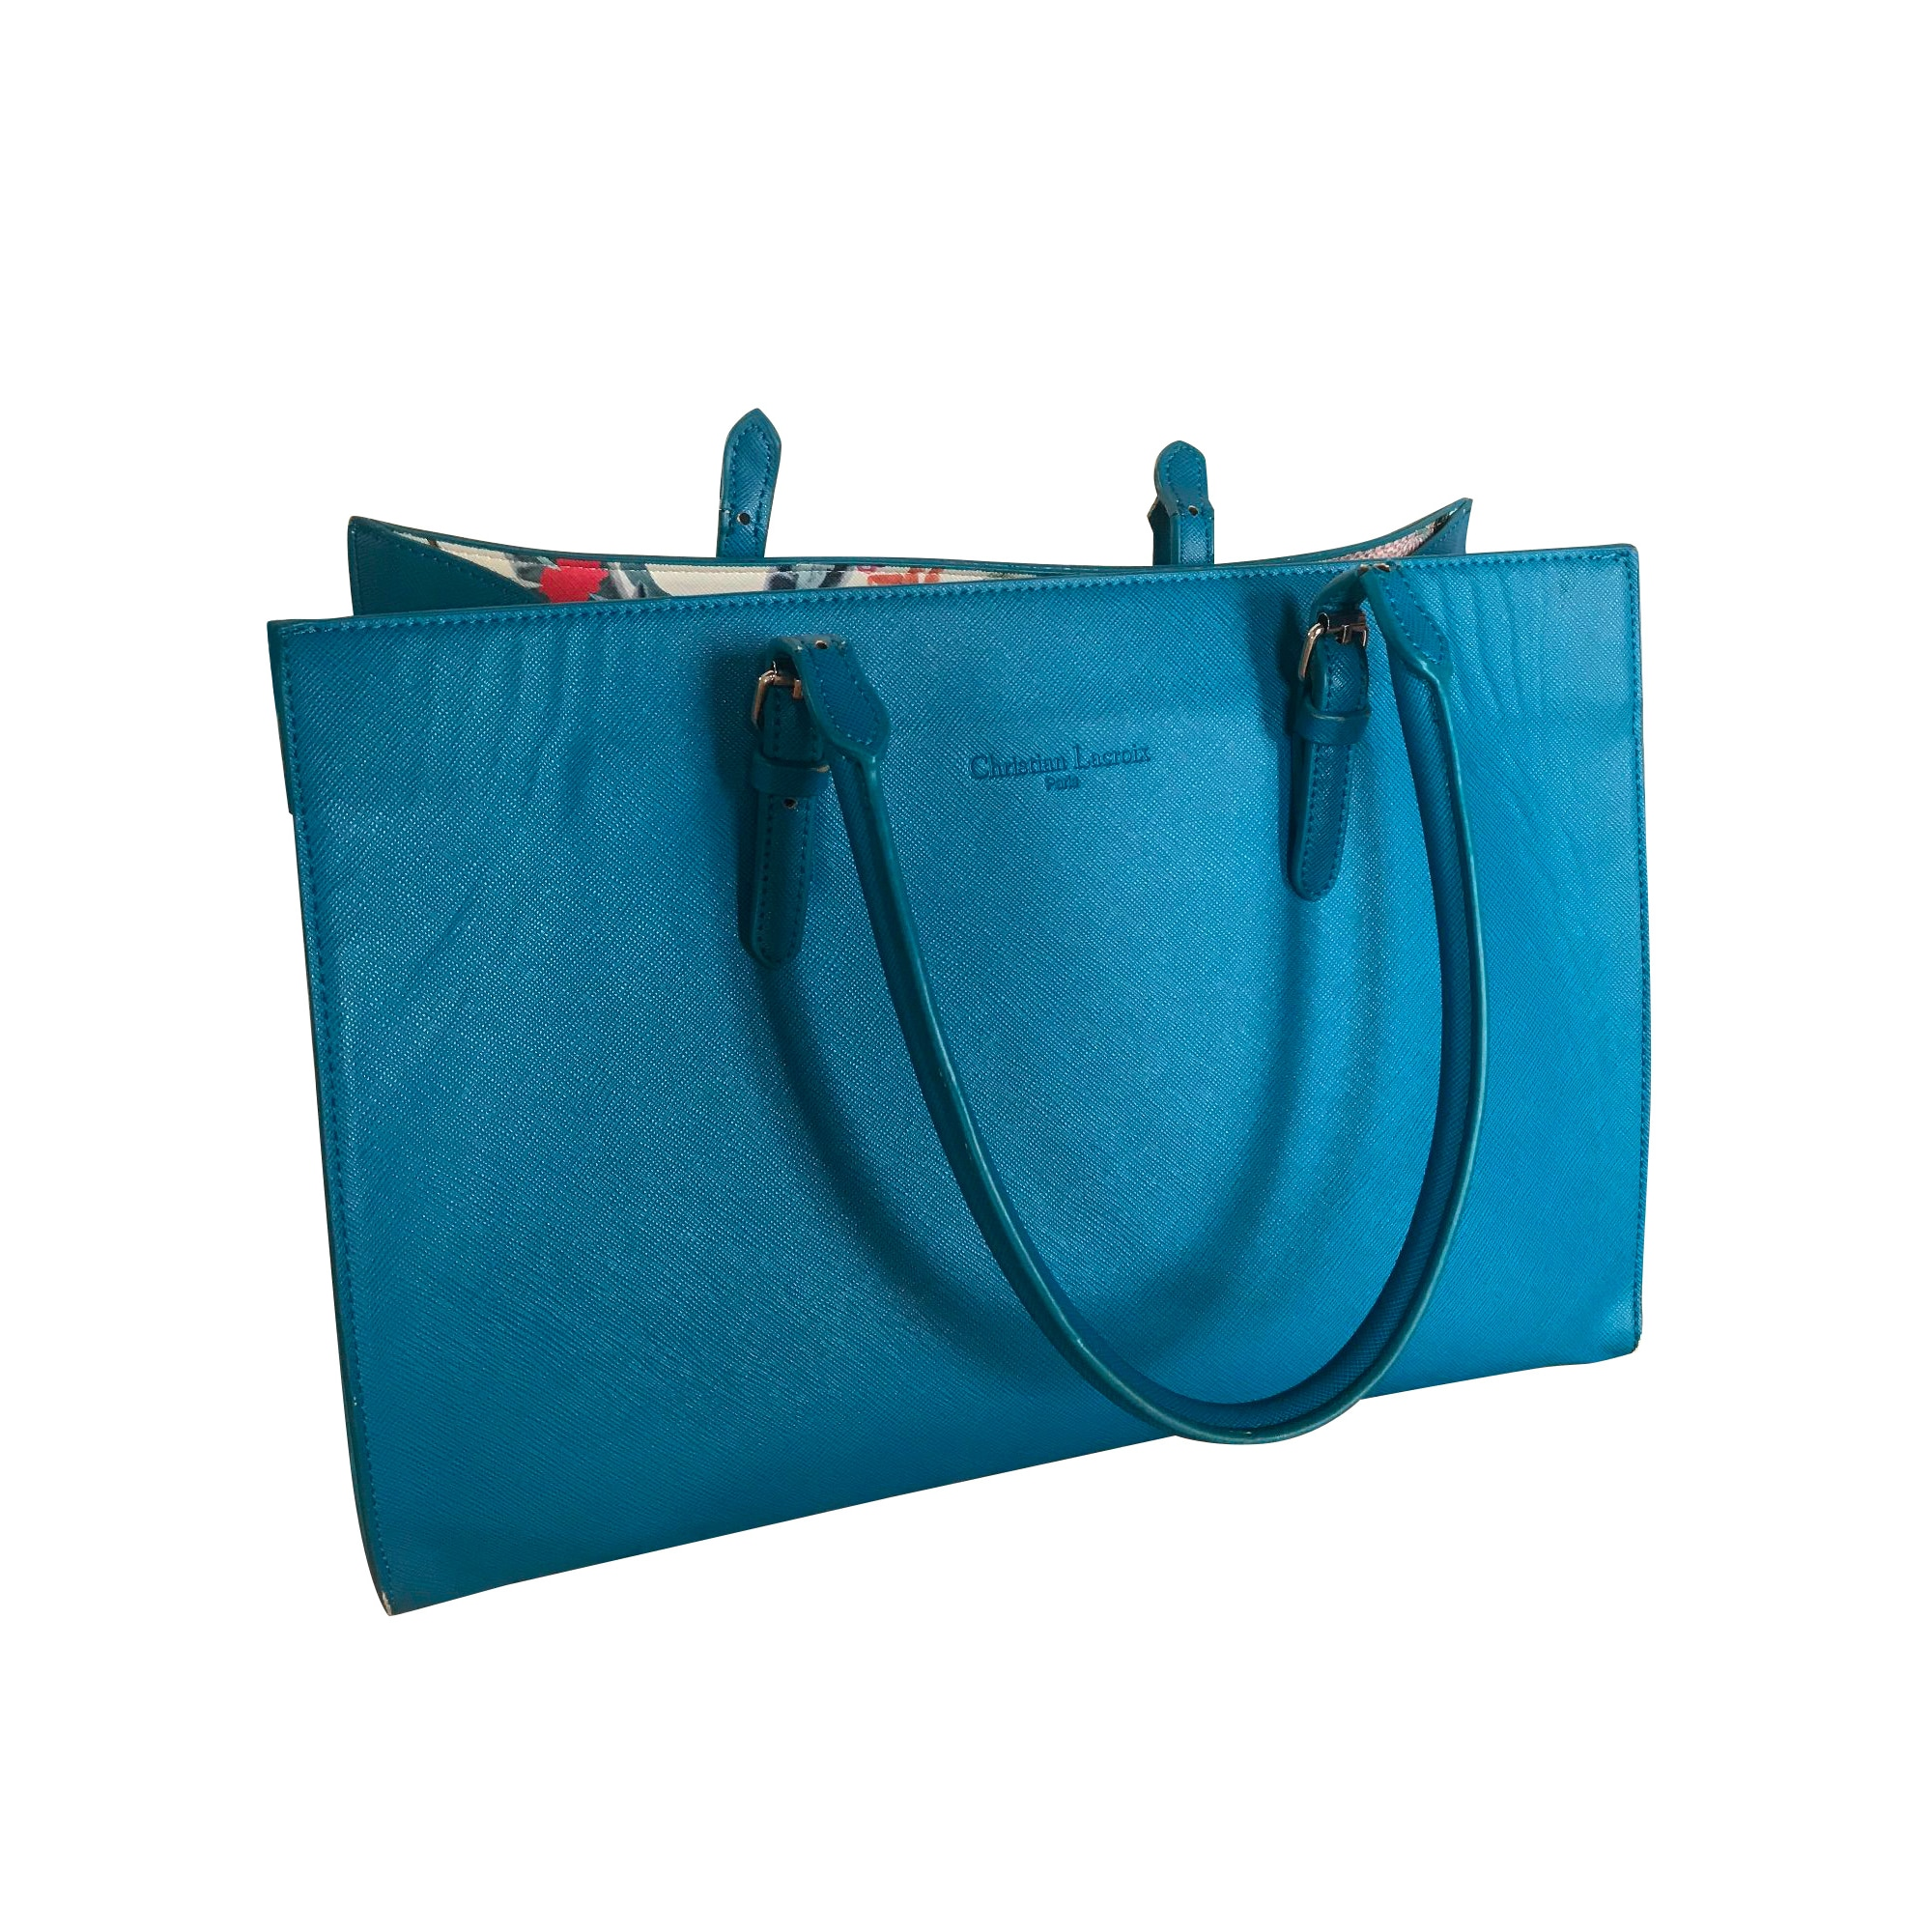 Sac à main en tissu CHRISTIAN LACROIX Bleu, bleu marine, bleu turquoise